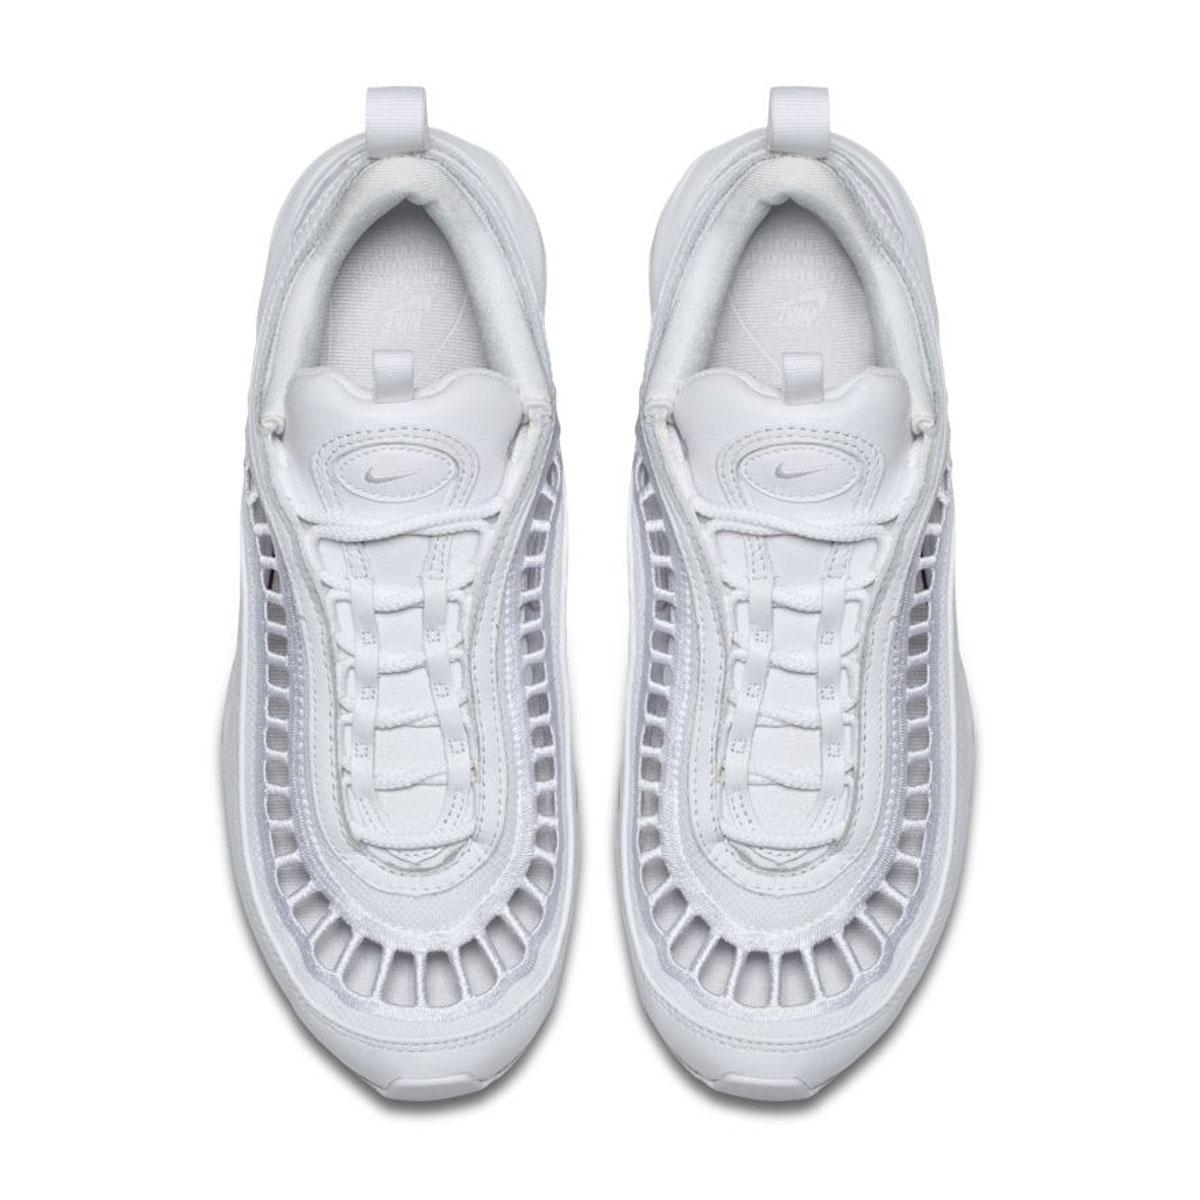 NIKE W AIR MAX 97 UL '17 SI (Nike women Air Max 97 UL 17 SI) WHITE/WHITE-VAST  GREY 18SS-I